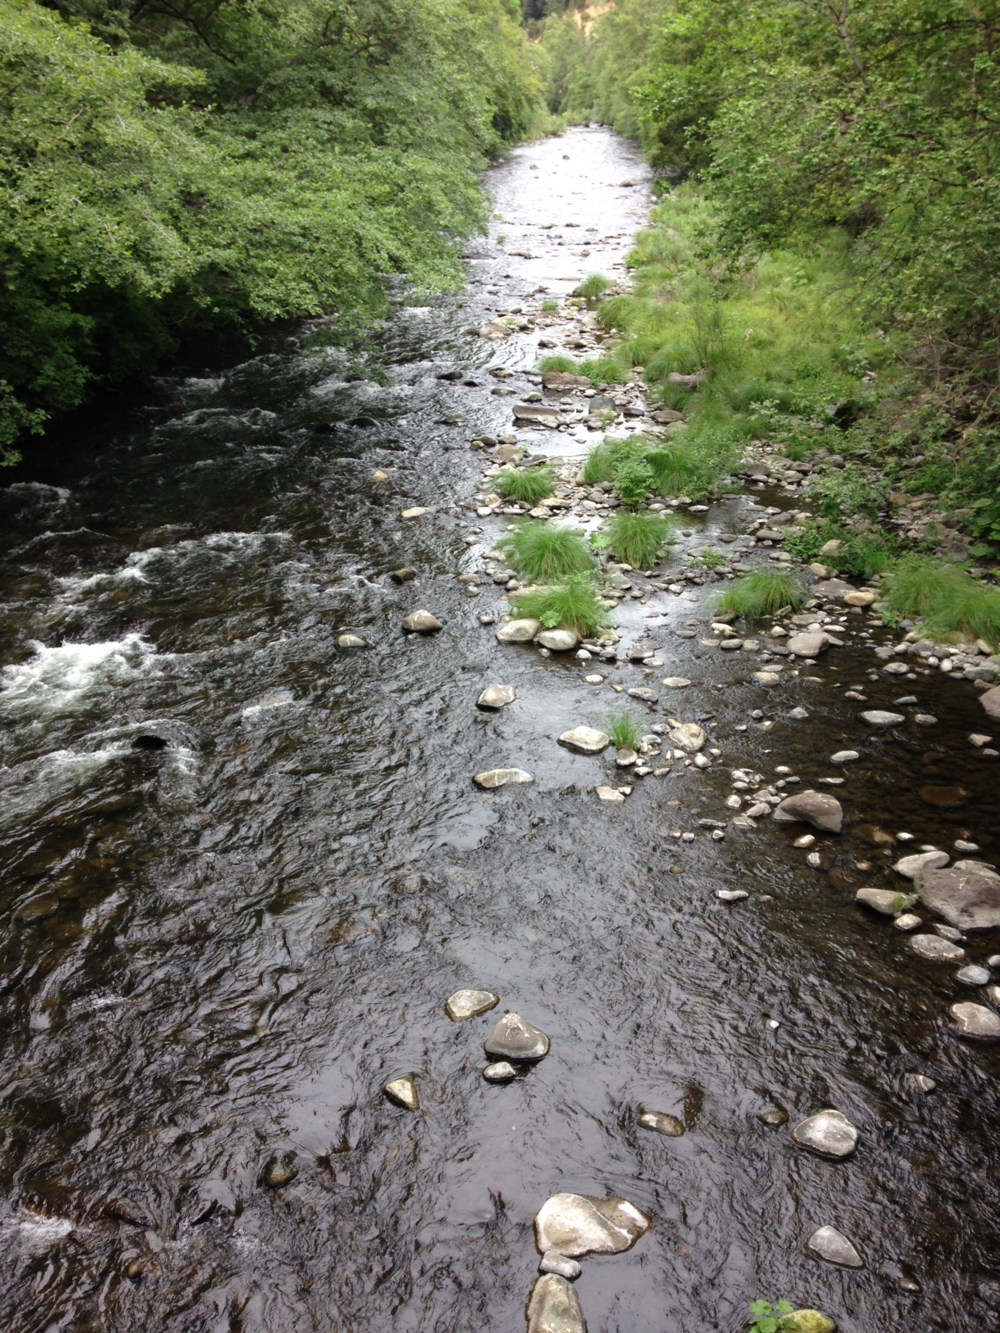 Dunsmuir Sacromento River.JPG